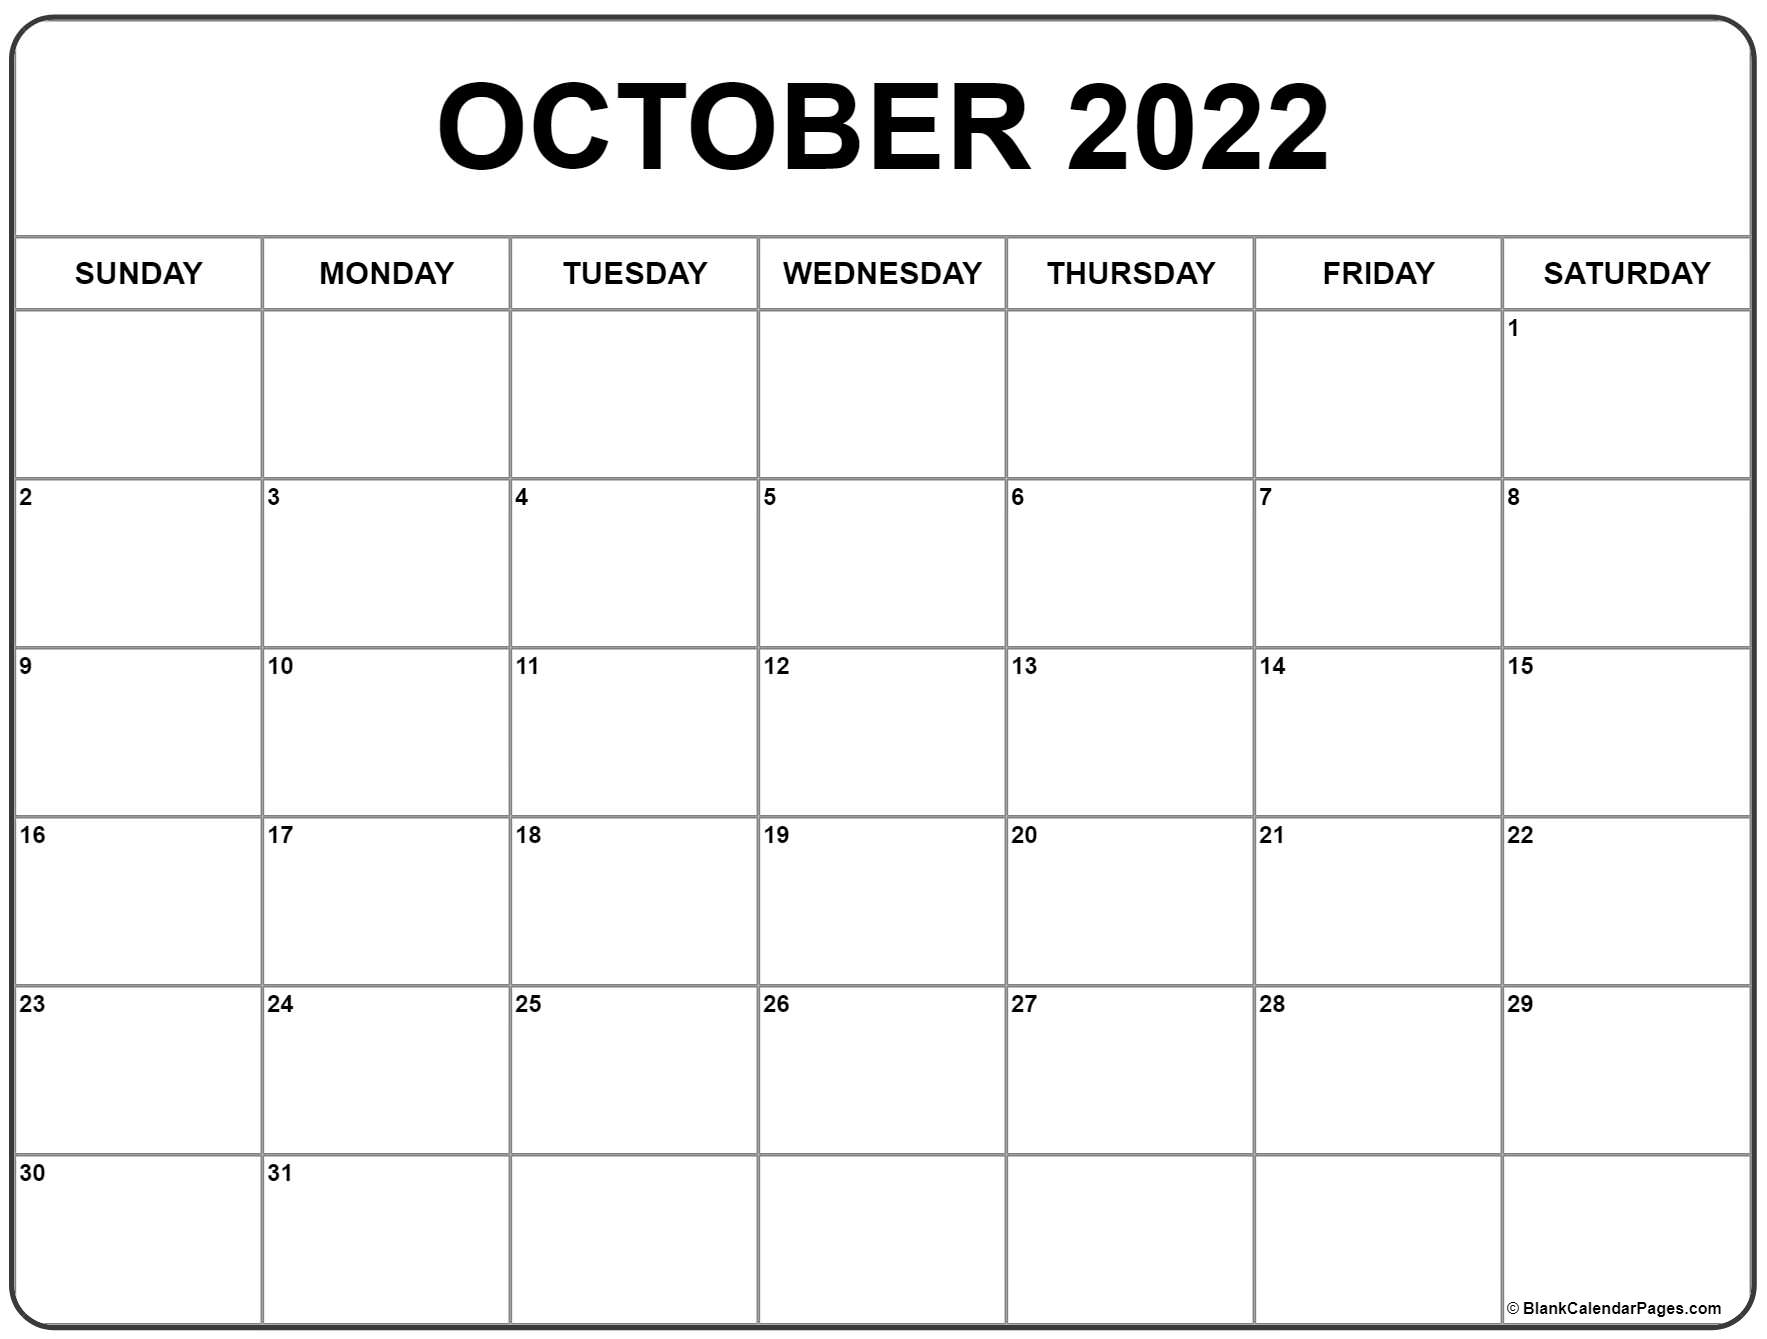 Monthly Calendar October 2022.October 2022 Calendar Free Printable Calendar Templates